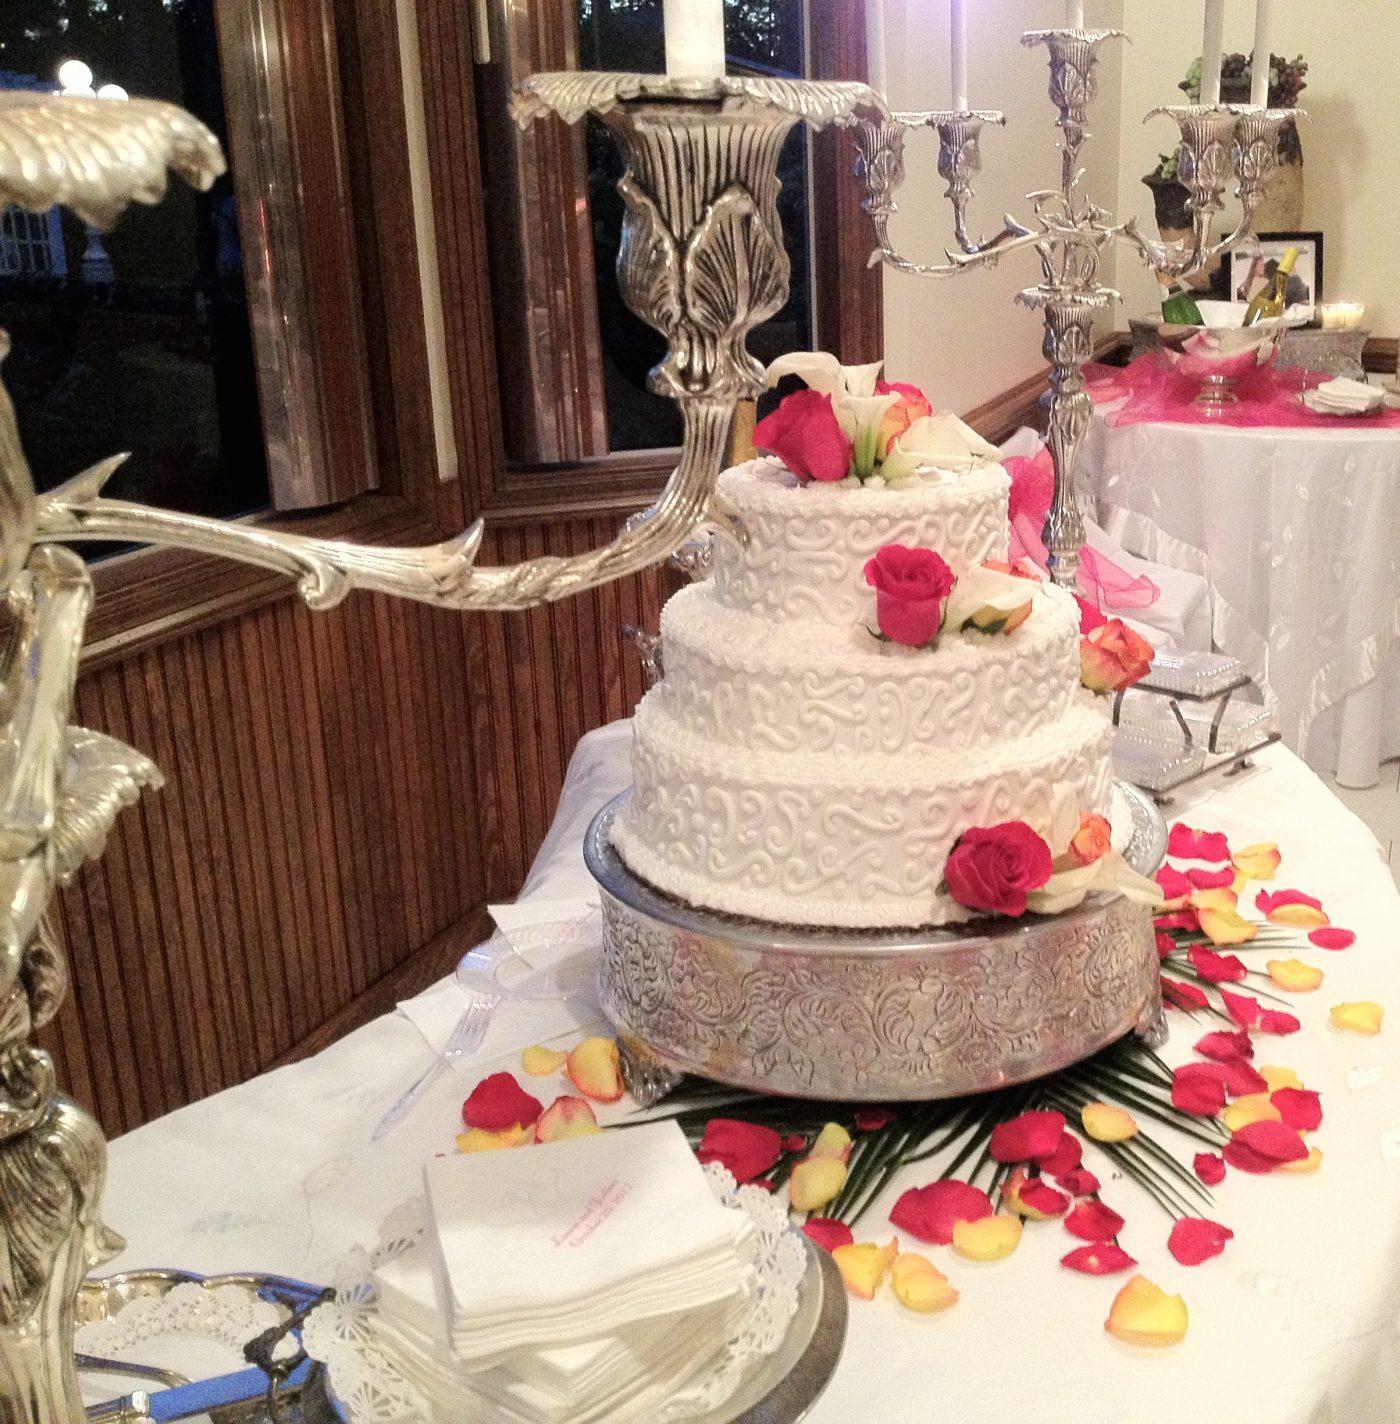 Bride's Cake at Gulf Shores Wedding Chapel